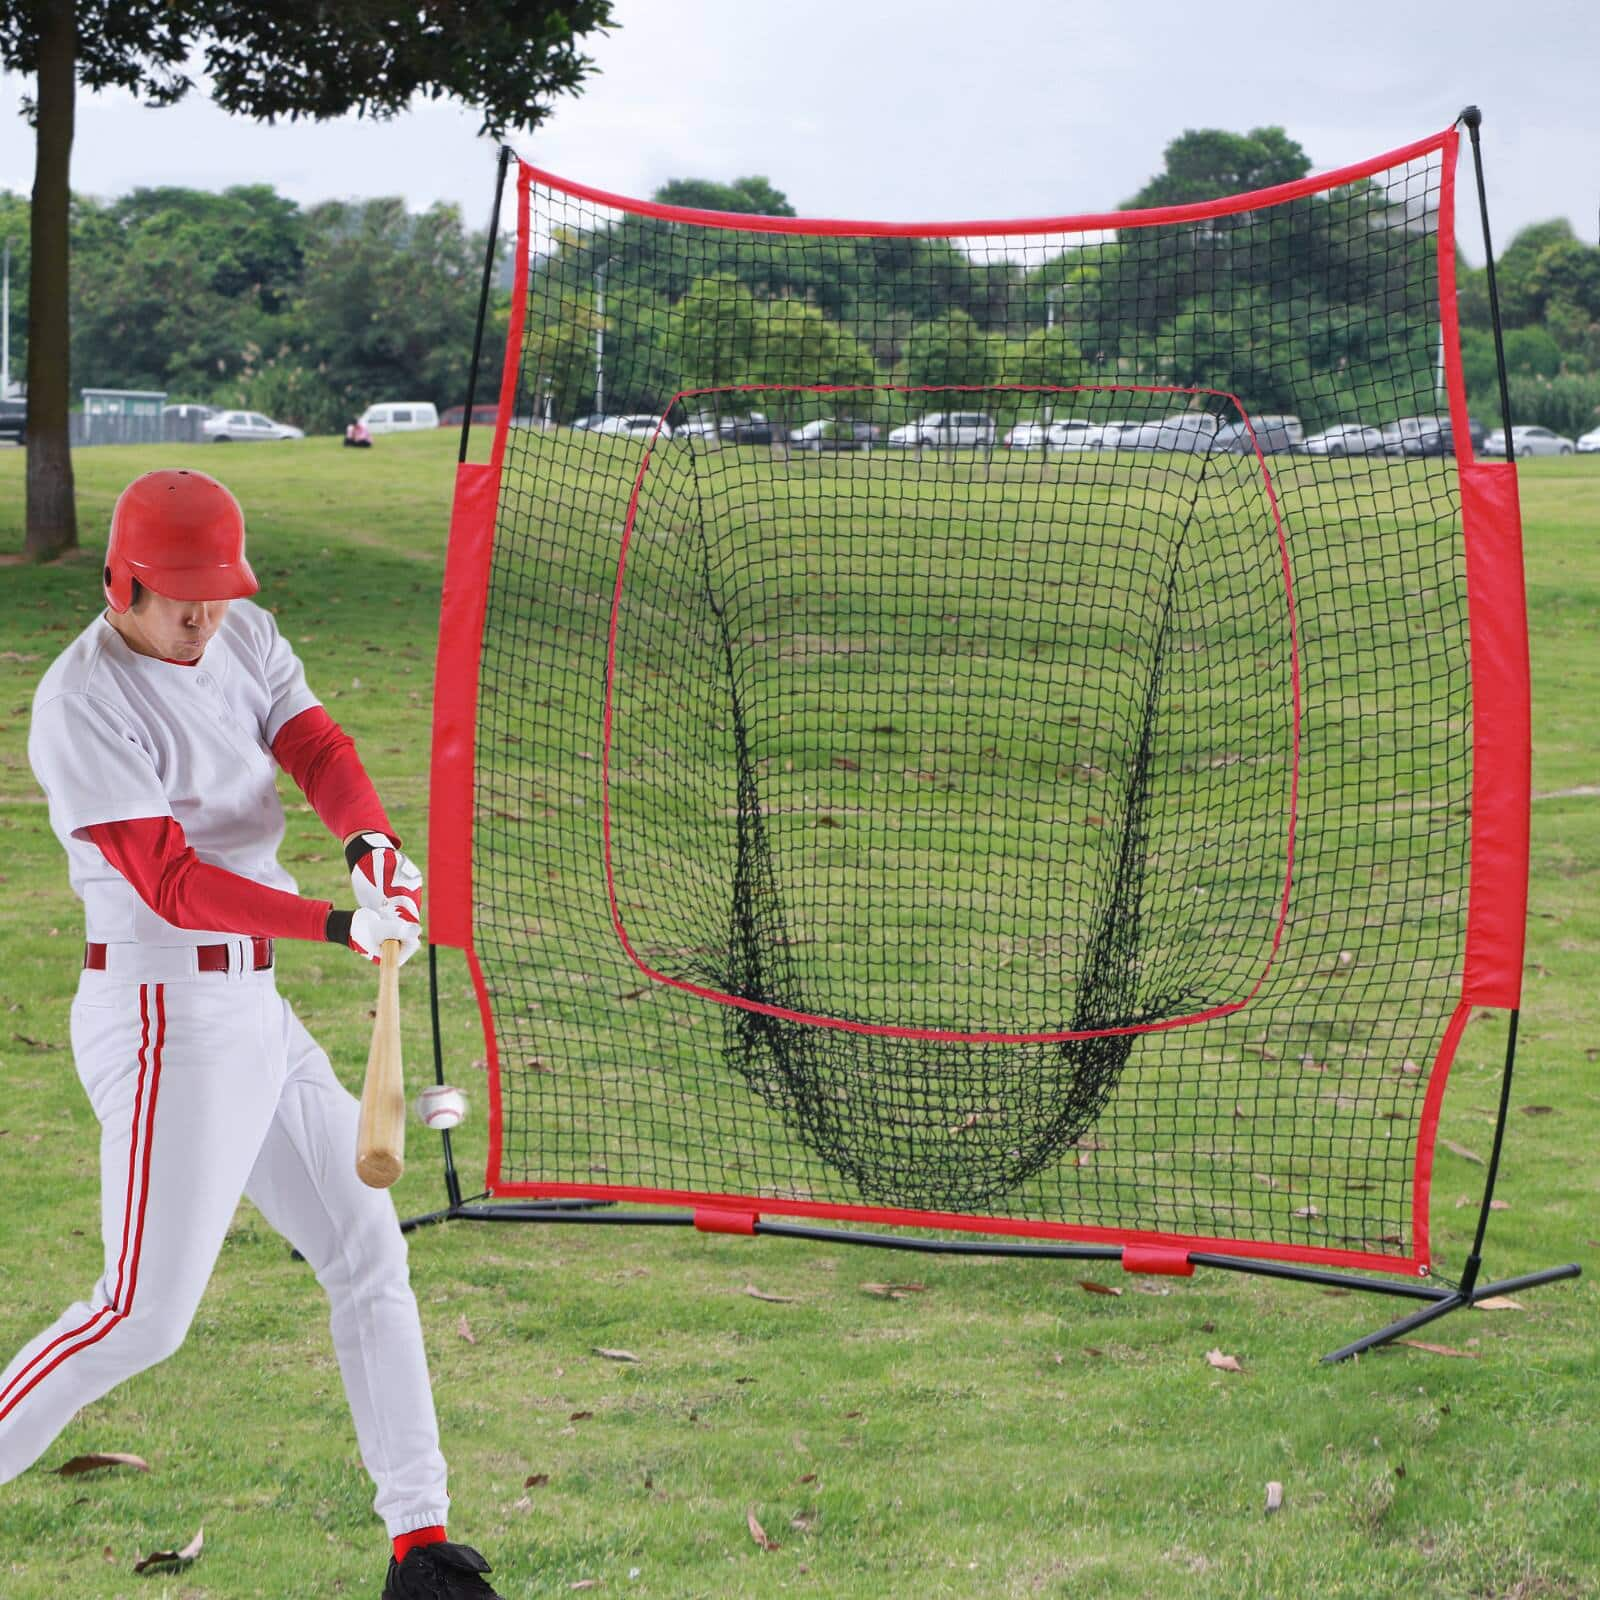 Yaheetech Portable 7' x 7' Baseball and Softball Practice Net $29.40 + Free shipping